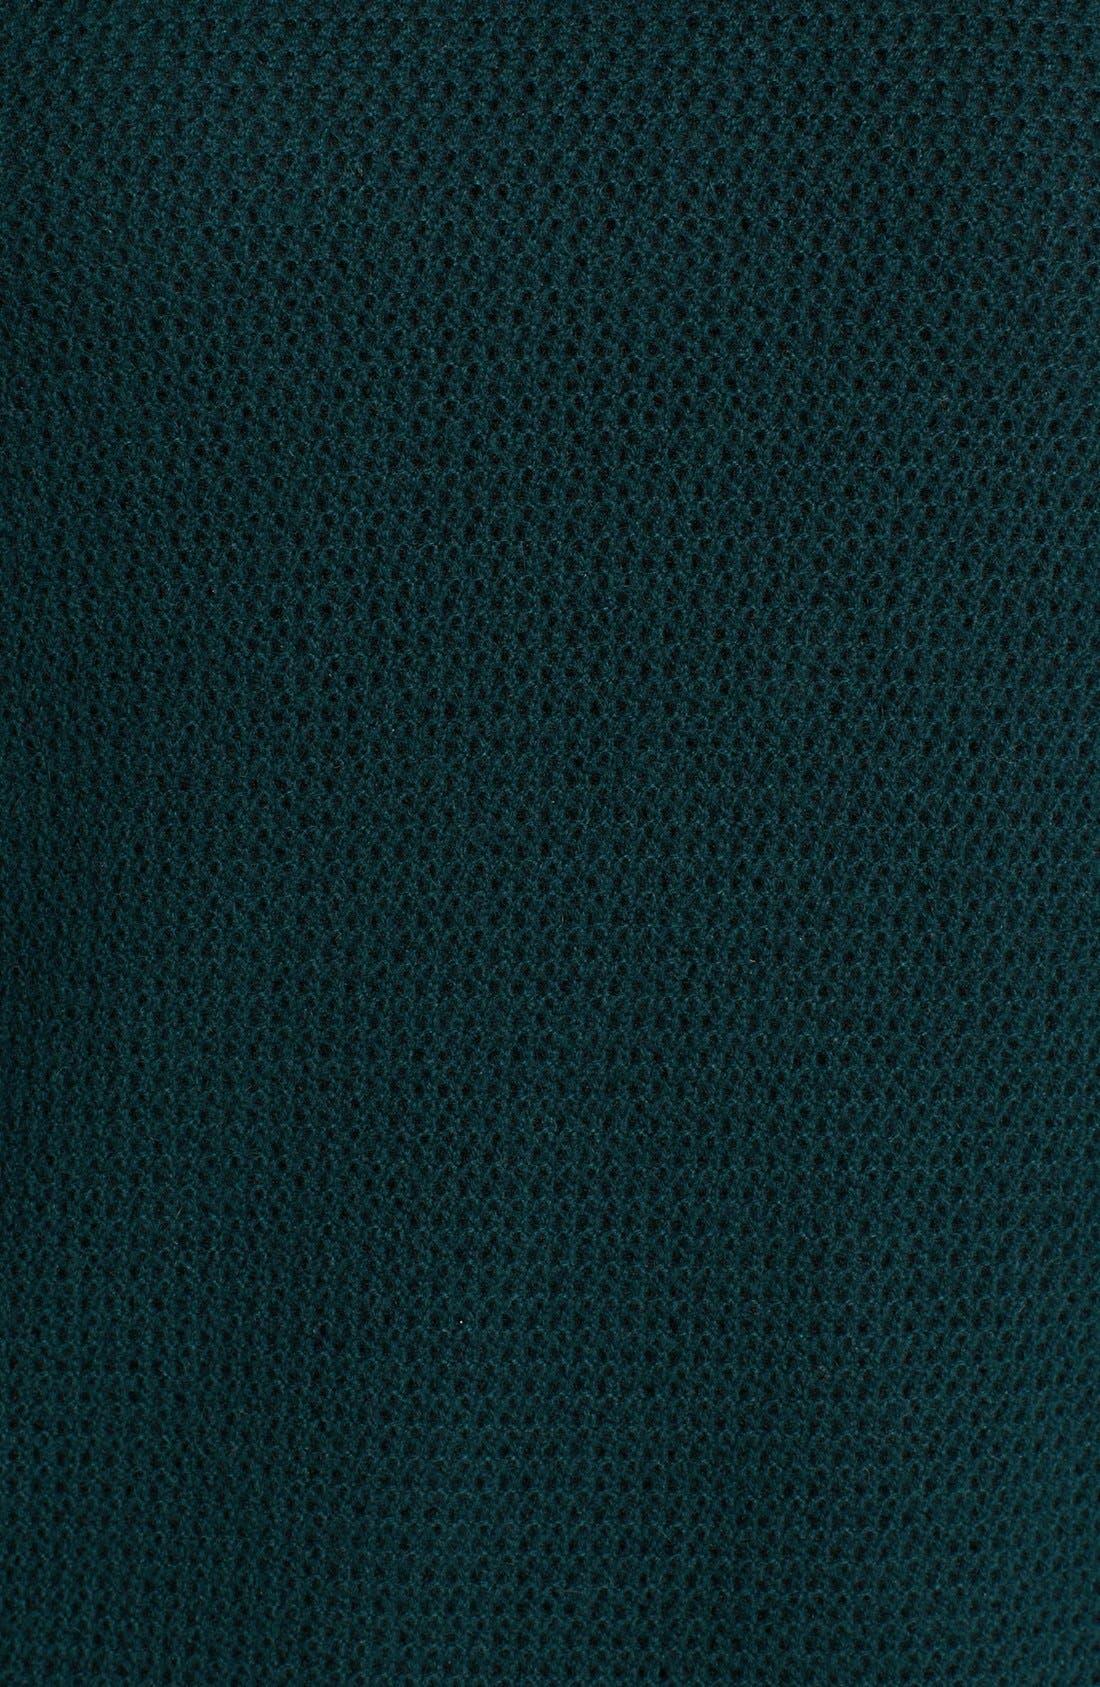 Alternate Image 3  - Elie Tahari 'Nancy' Faux Wrap Back Cashmere Sweater